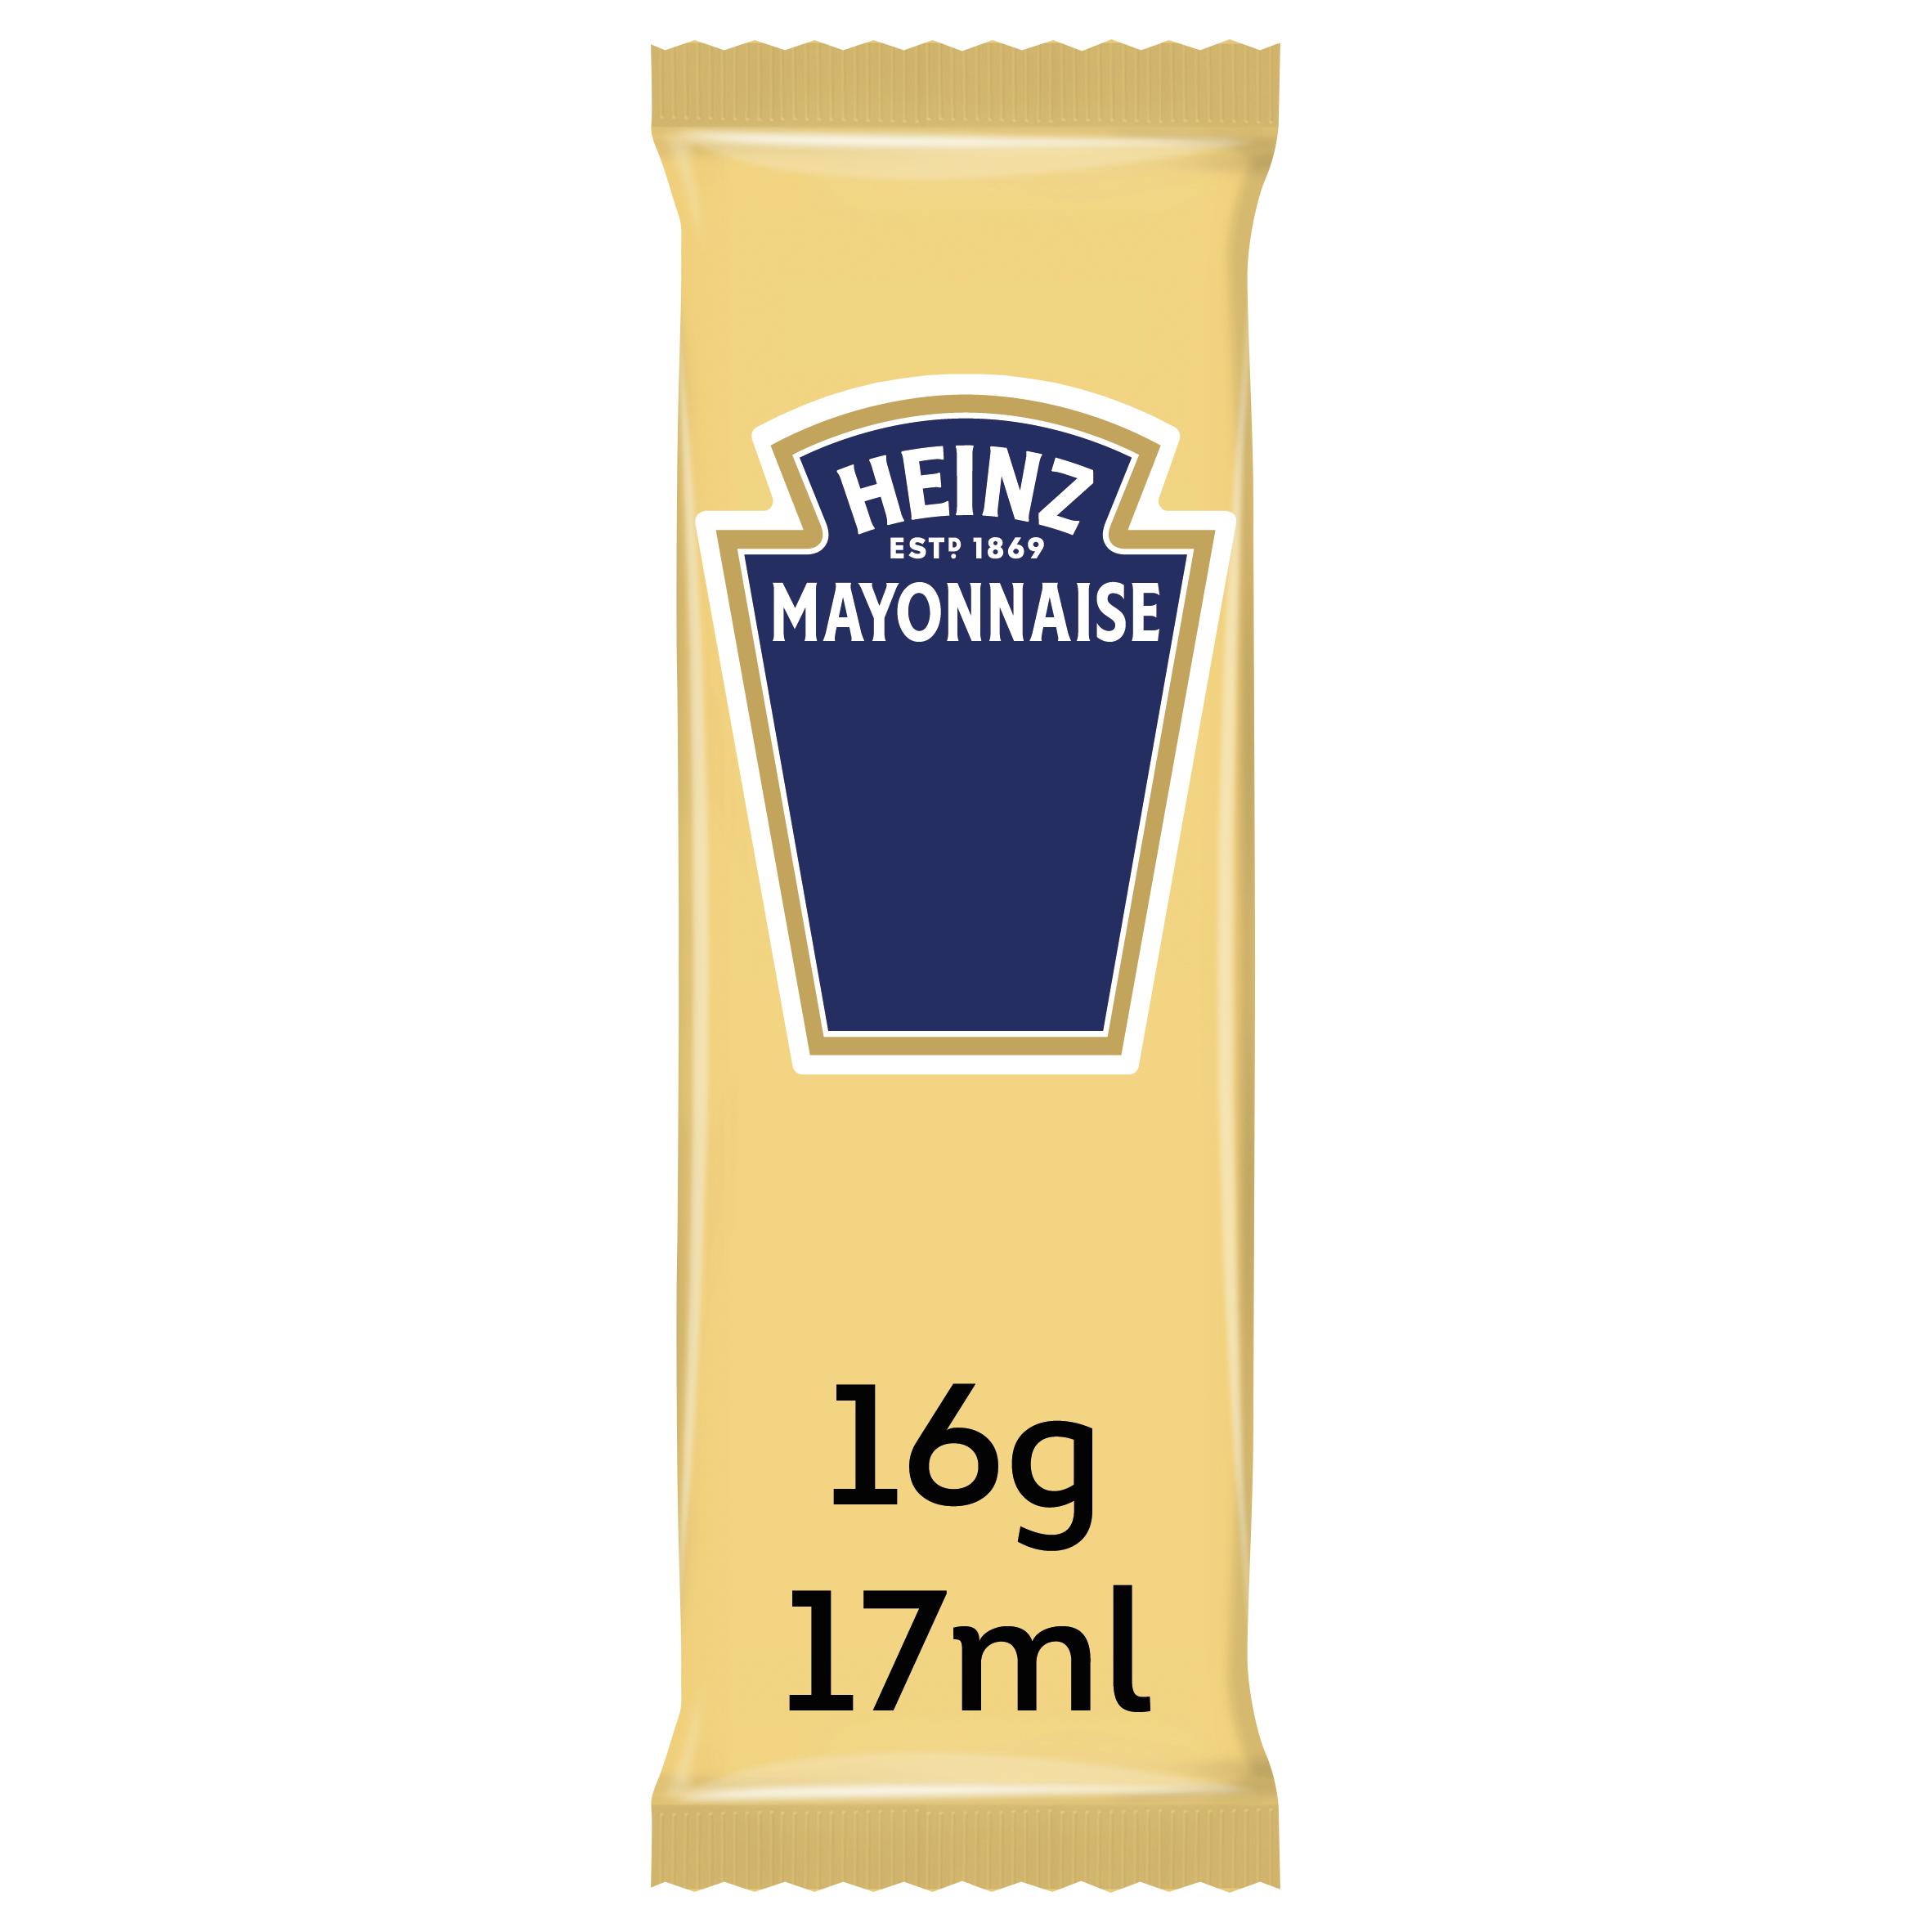 Heinz Mayonaise sachet 17ml image